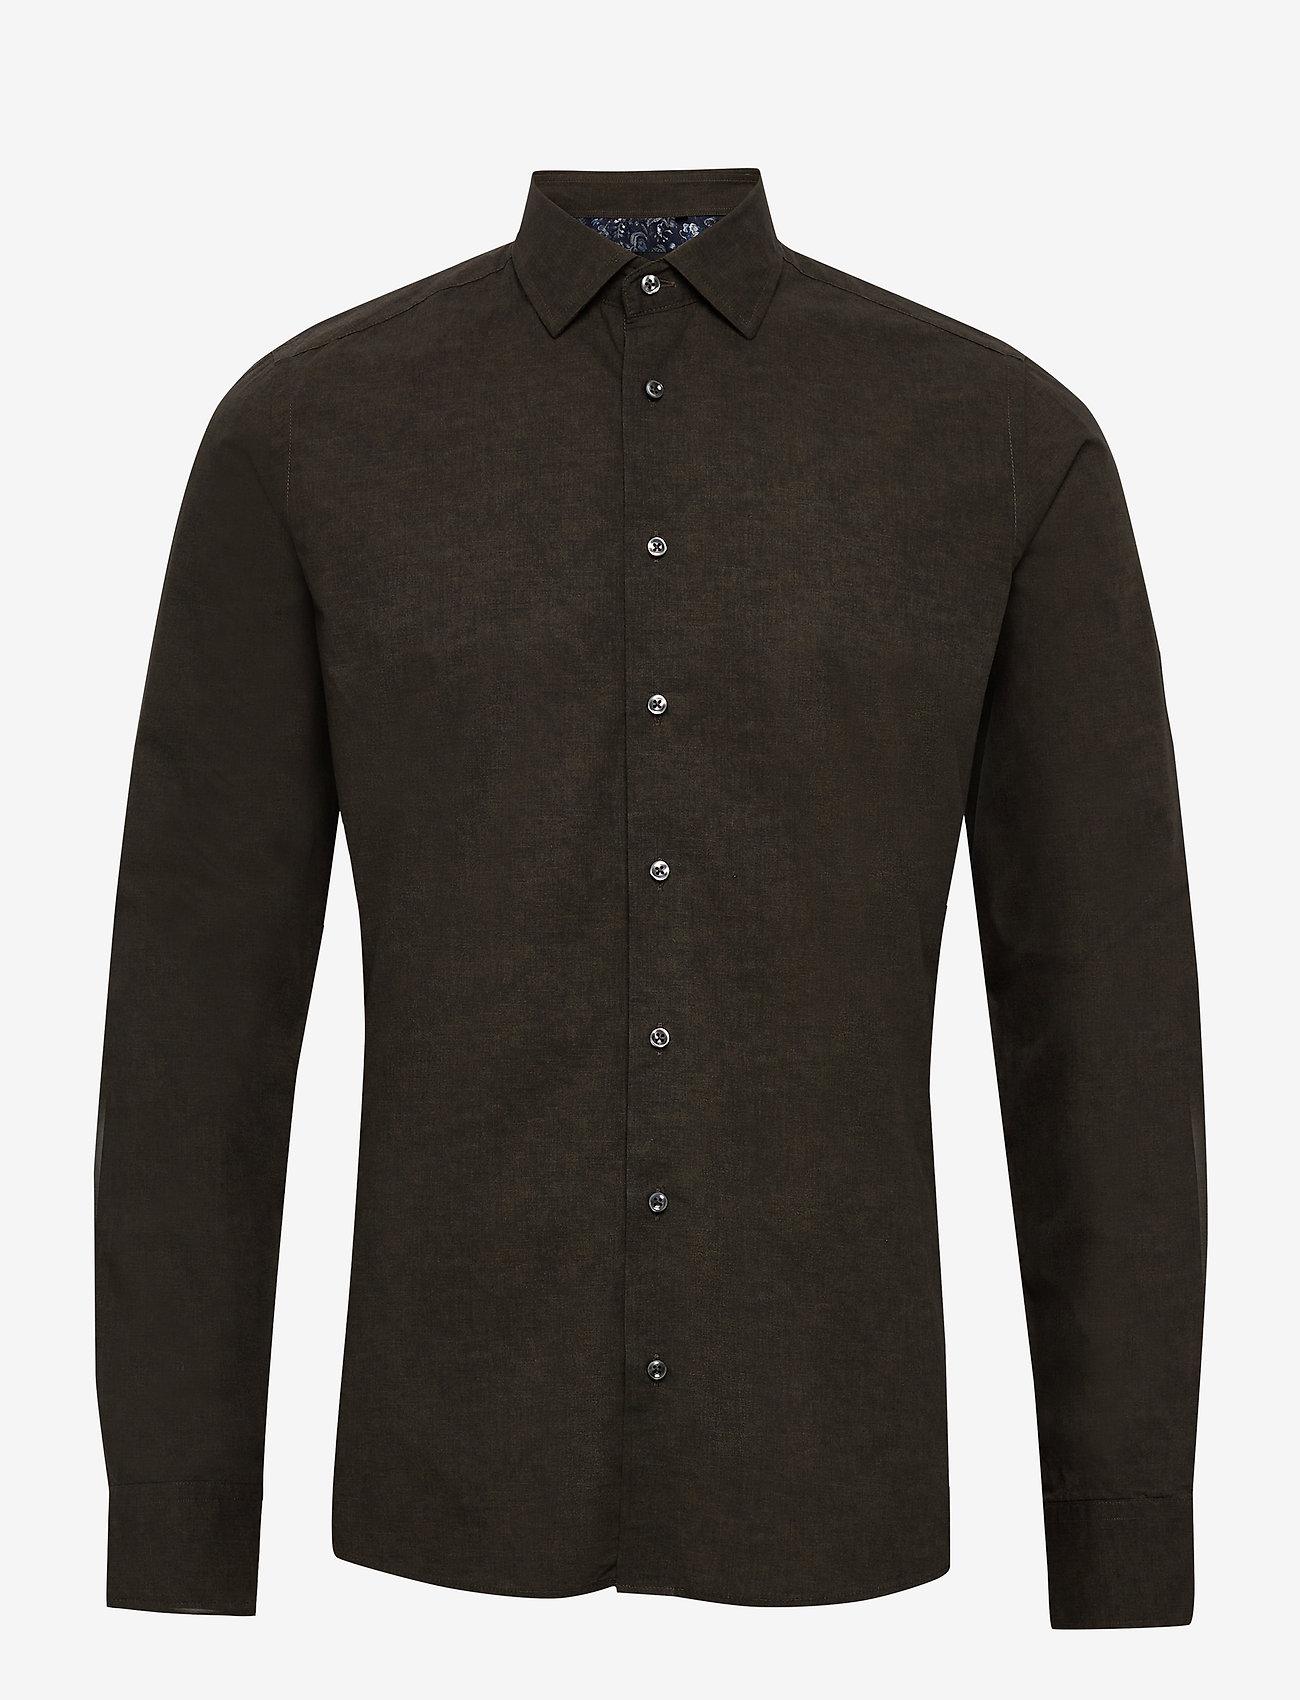 SAND - 8669 - Iver 2 Soft - basic shirts - olive/khaki - 0